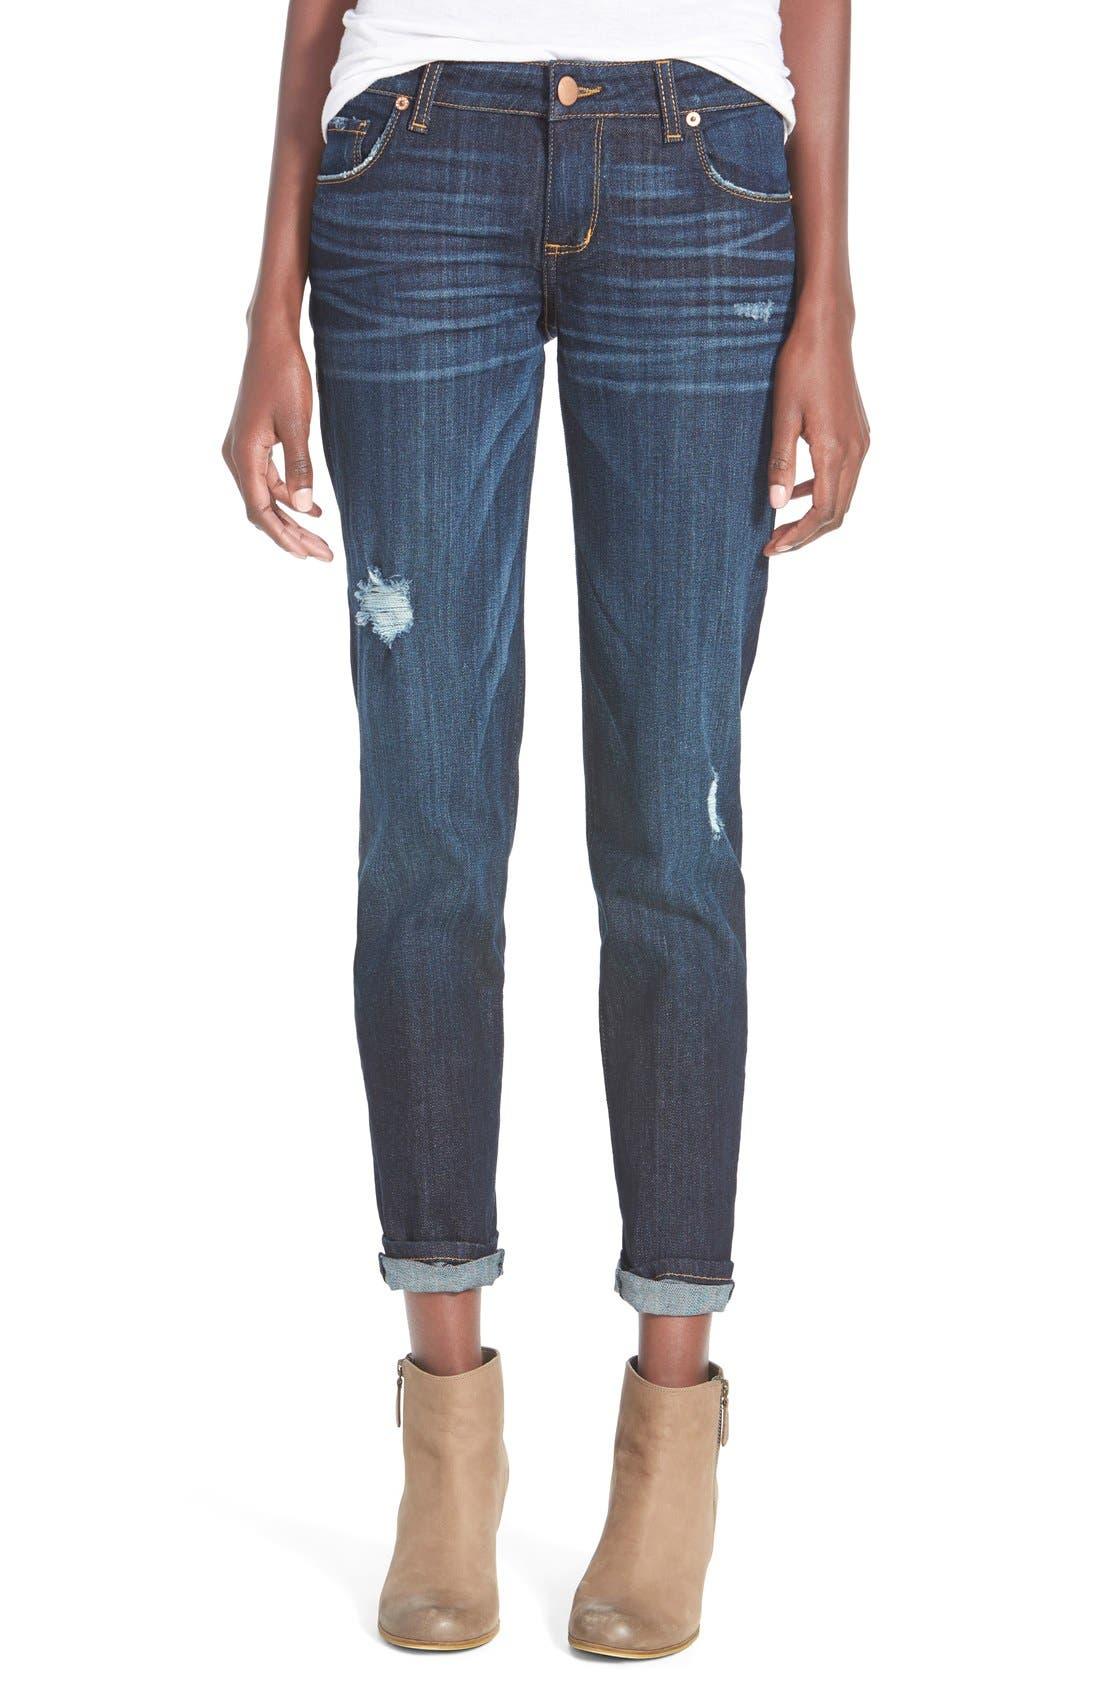 Alternate Image 1 Selected - STS Blue 'Joey' Boyfriend Jeans (Sonoma Wash)